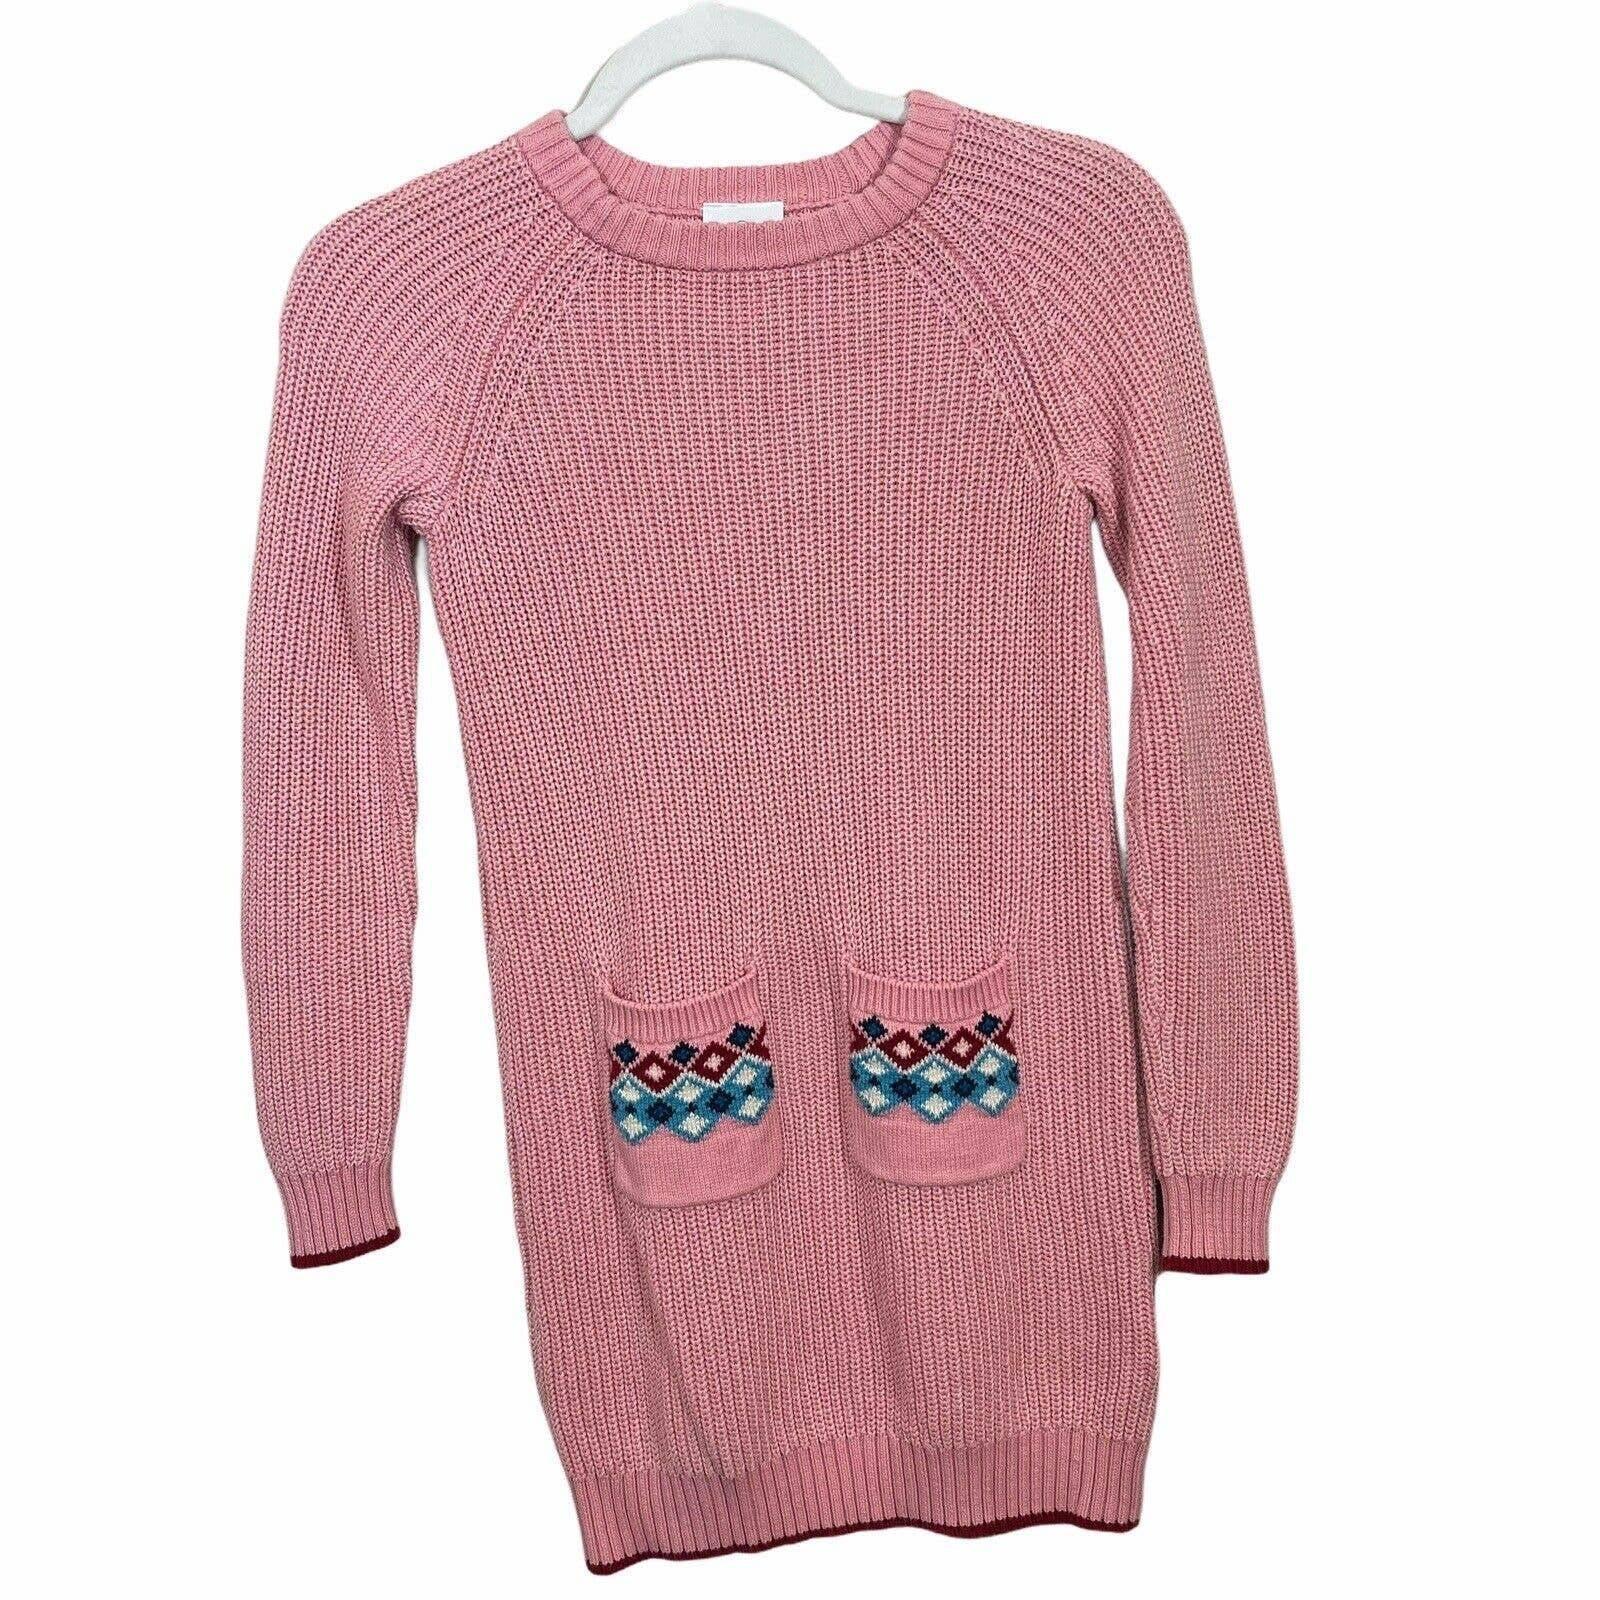 Hanna Andersson Sweater Dress Girl 130 8